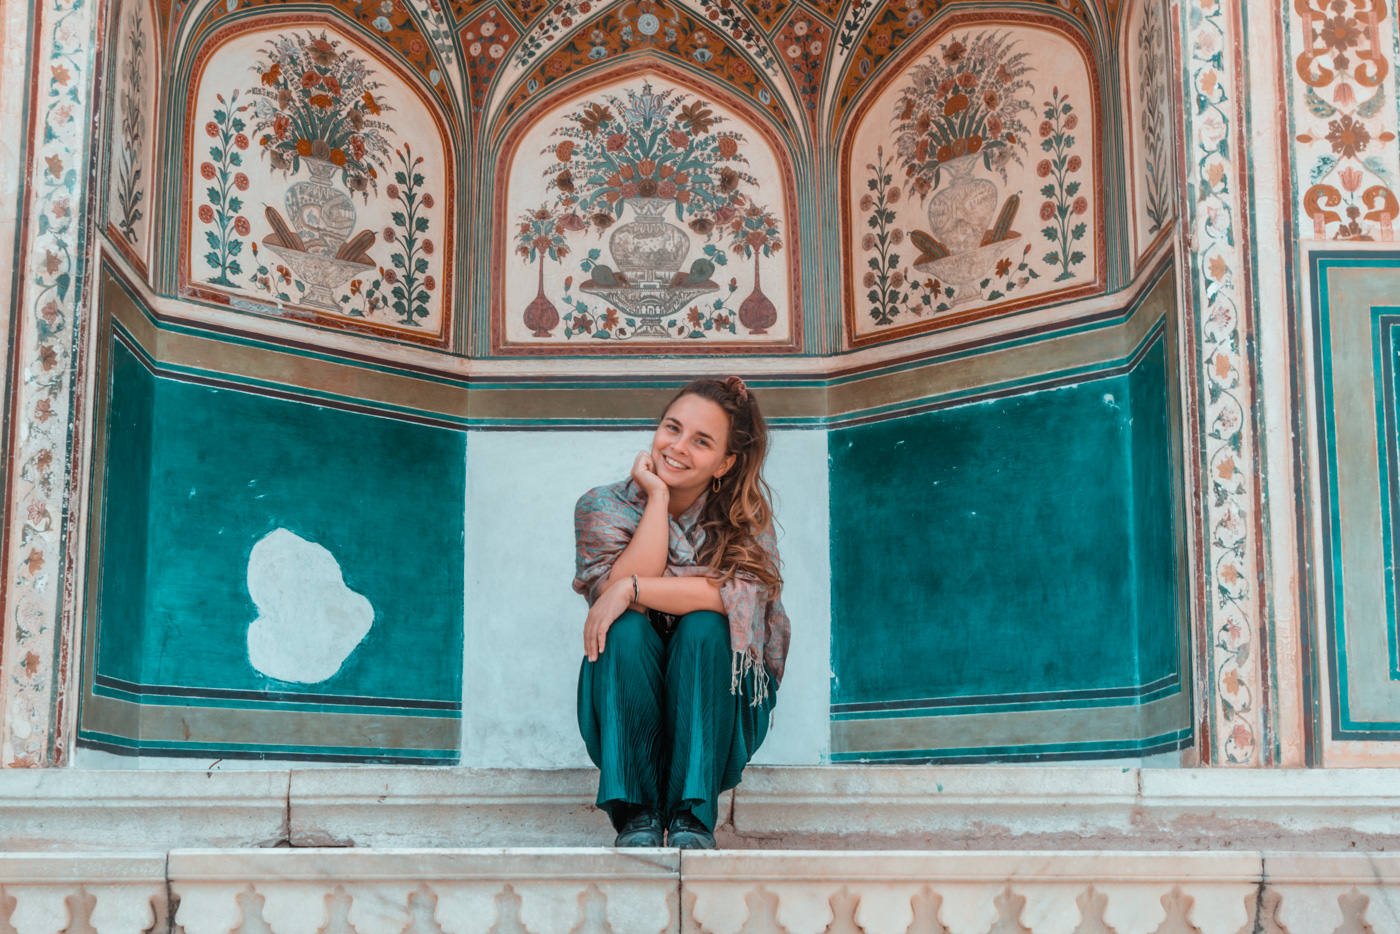 Julia vor Wandmalereien im Amber Palace in Jaipur